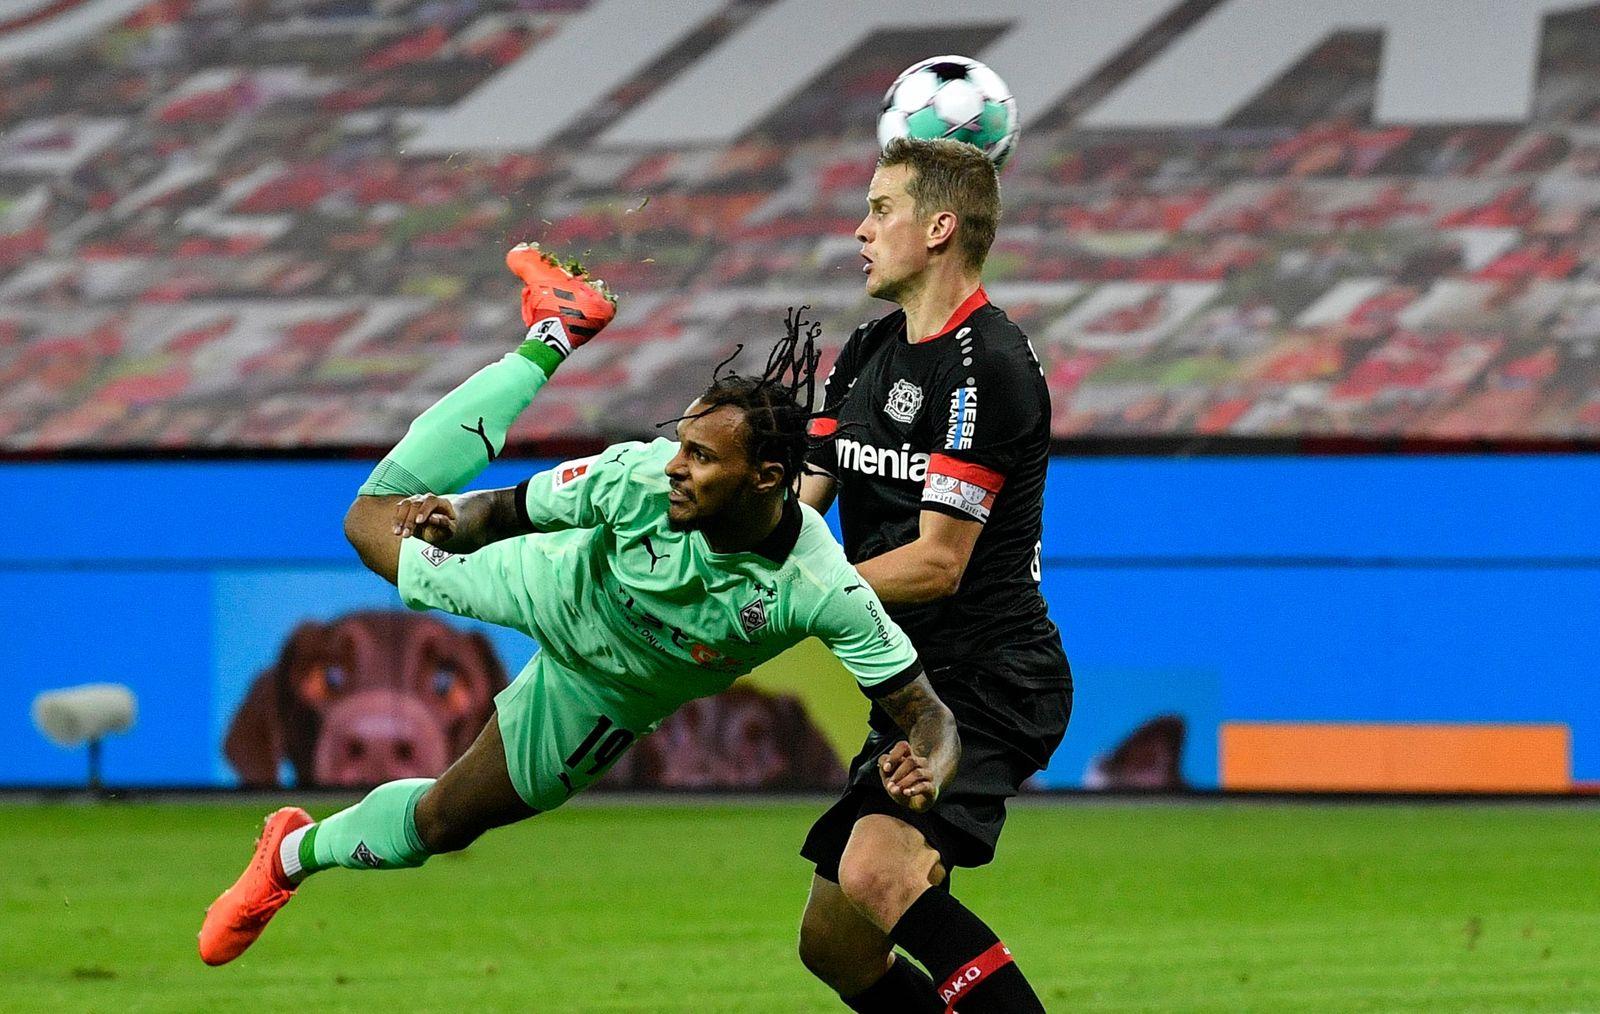 Bayer Leverkusen vs Borussia Moenchengladbach, Deu - 08 Nov 2020